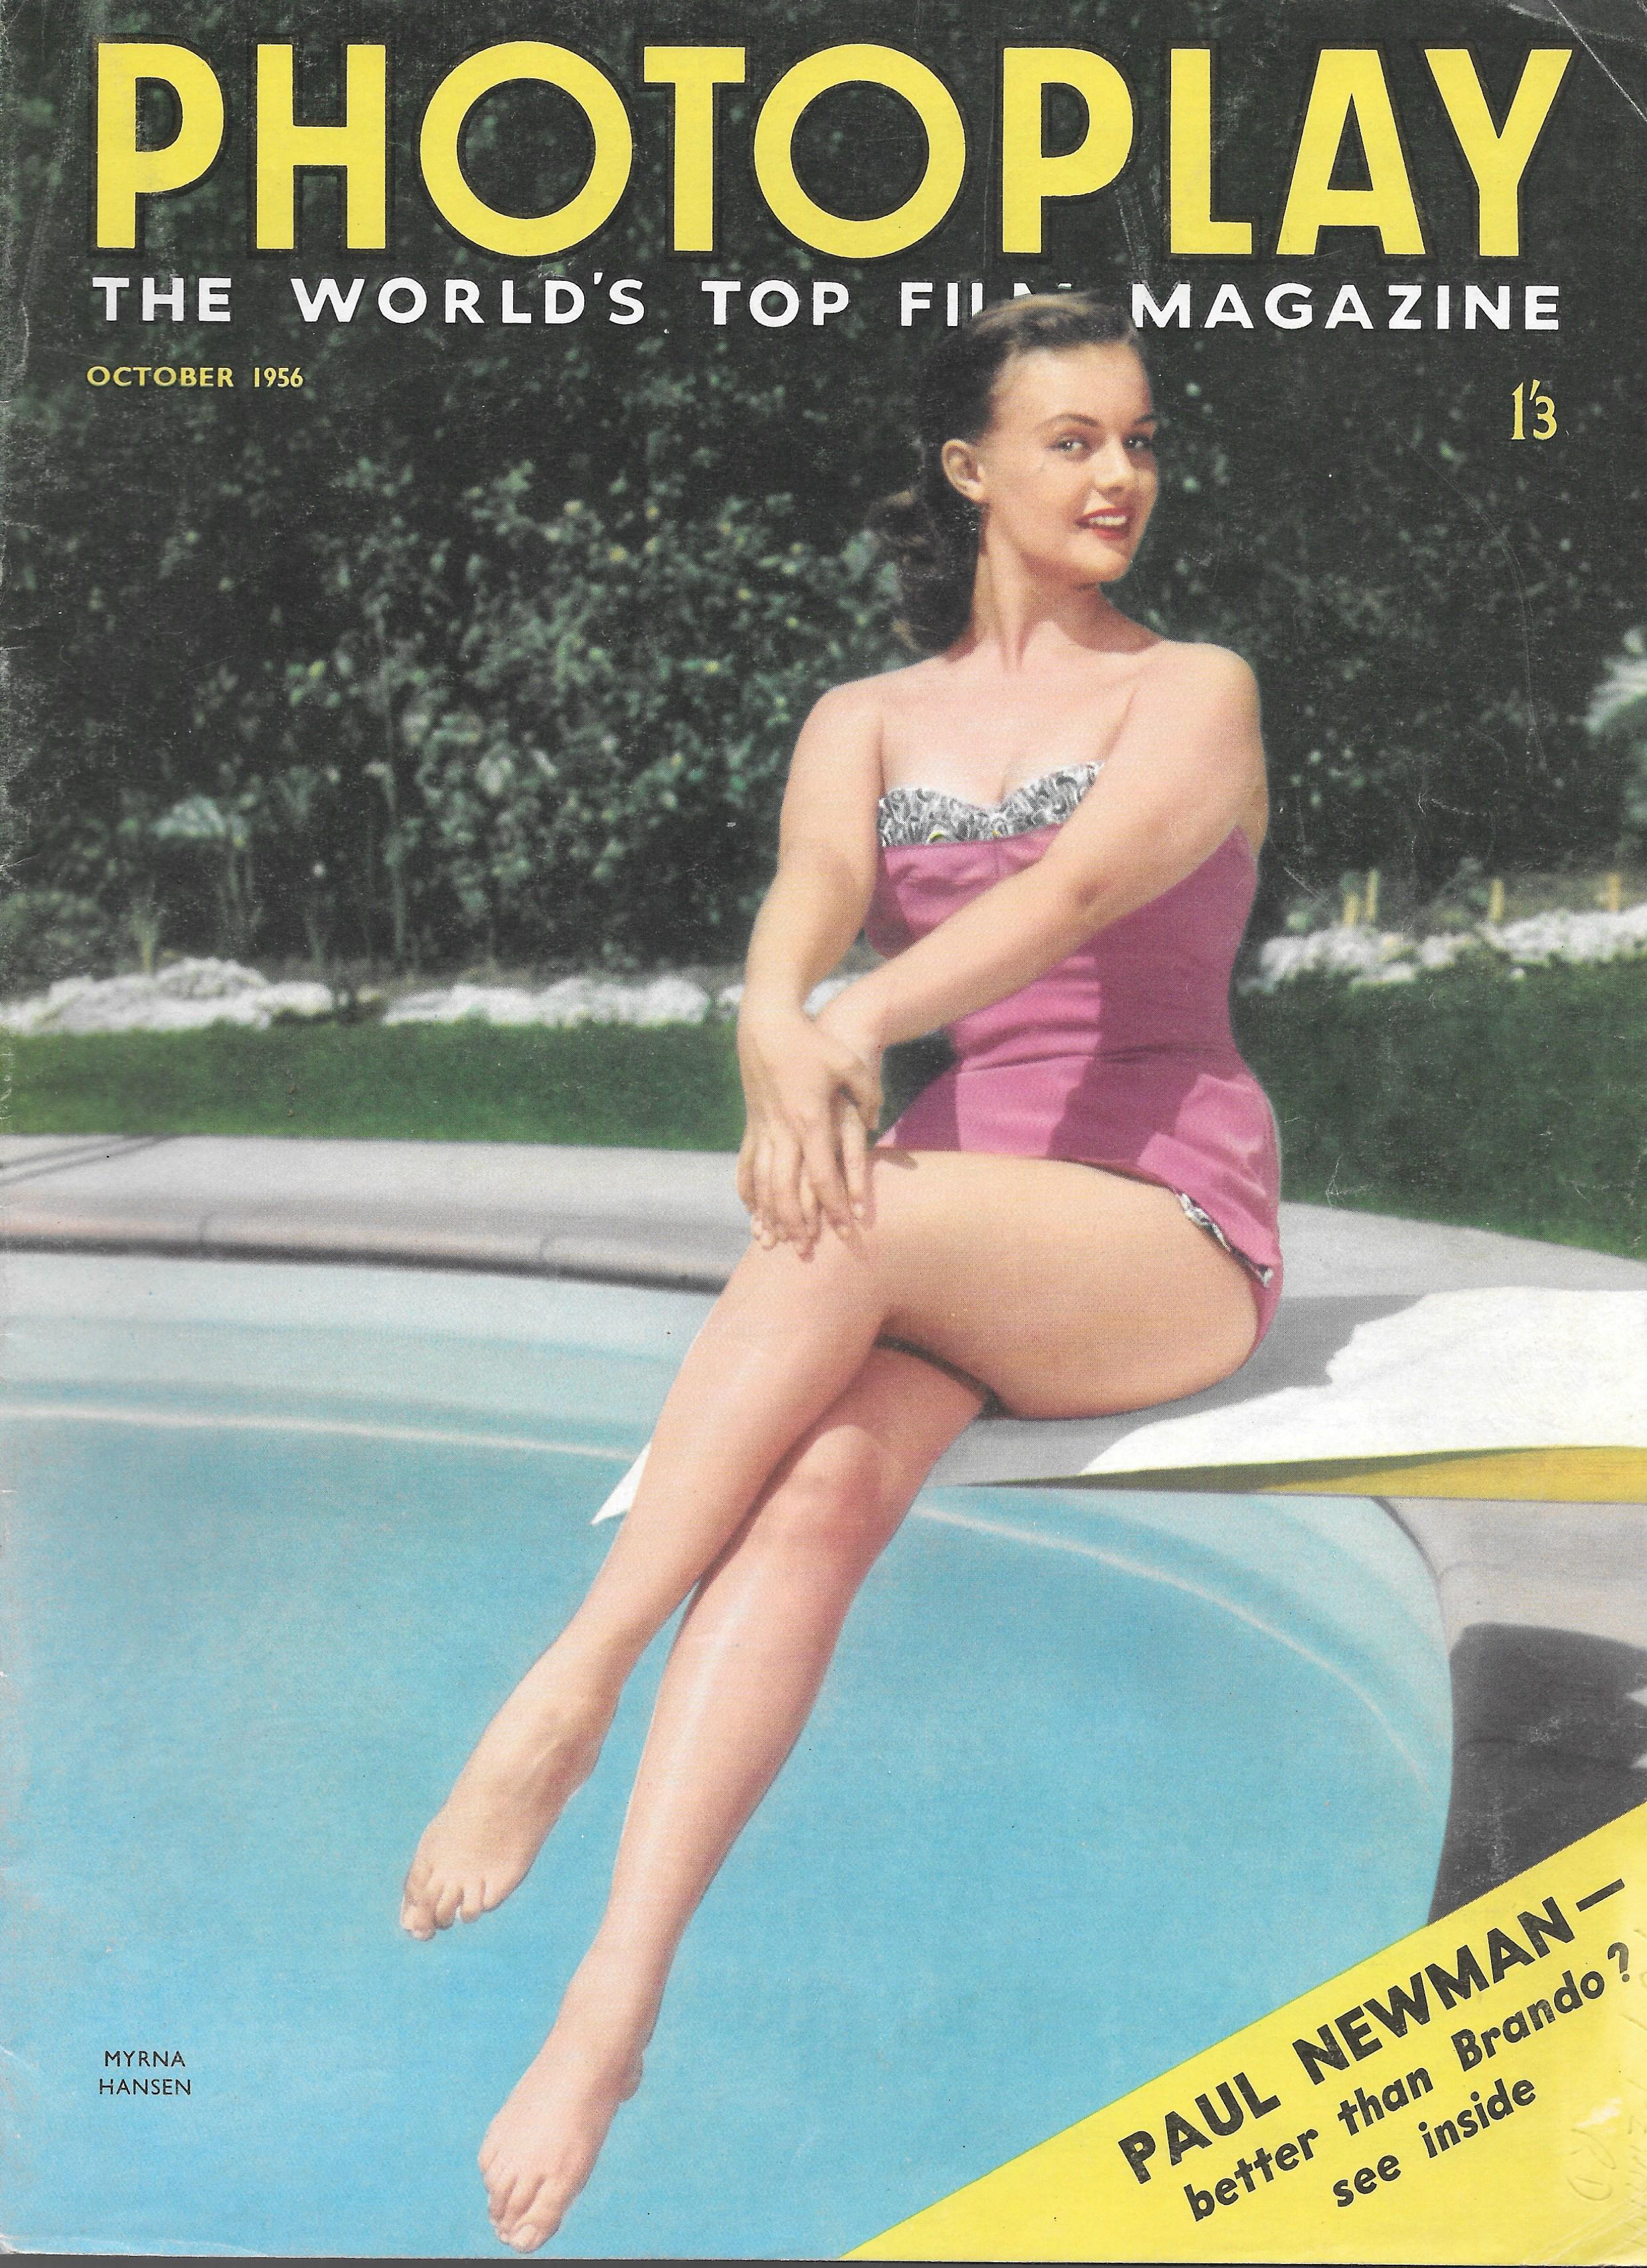 Cleavage Imelda Papin (b. 1956) nudes (85 pics) Cleavage, Instagram, cameltoe